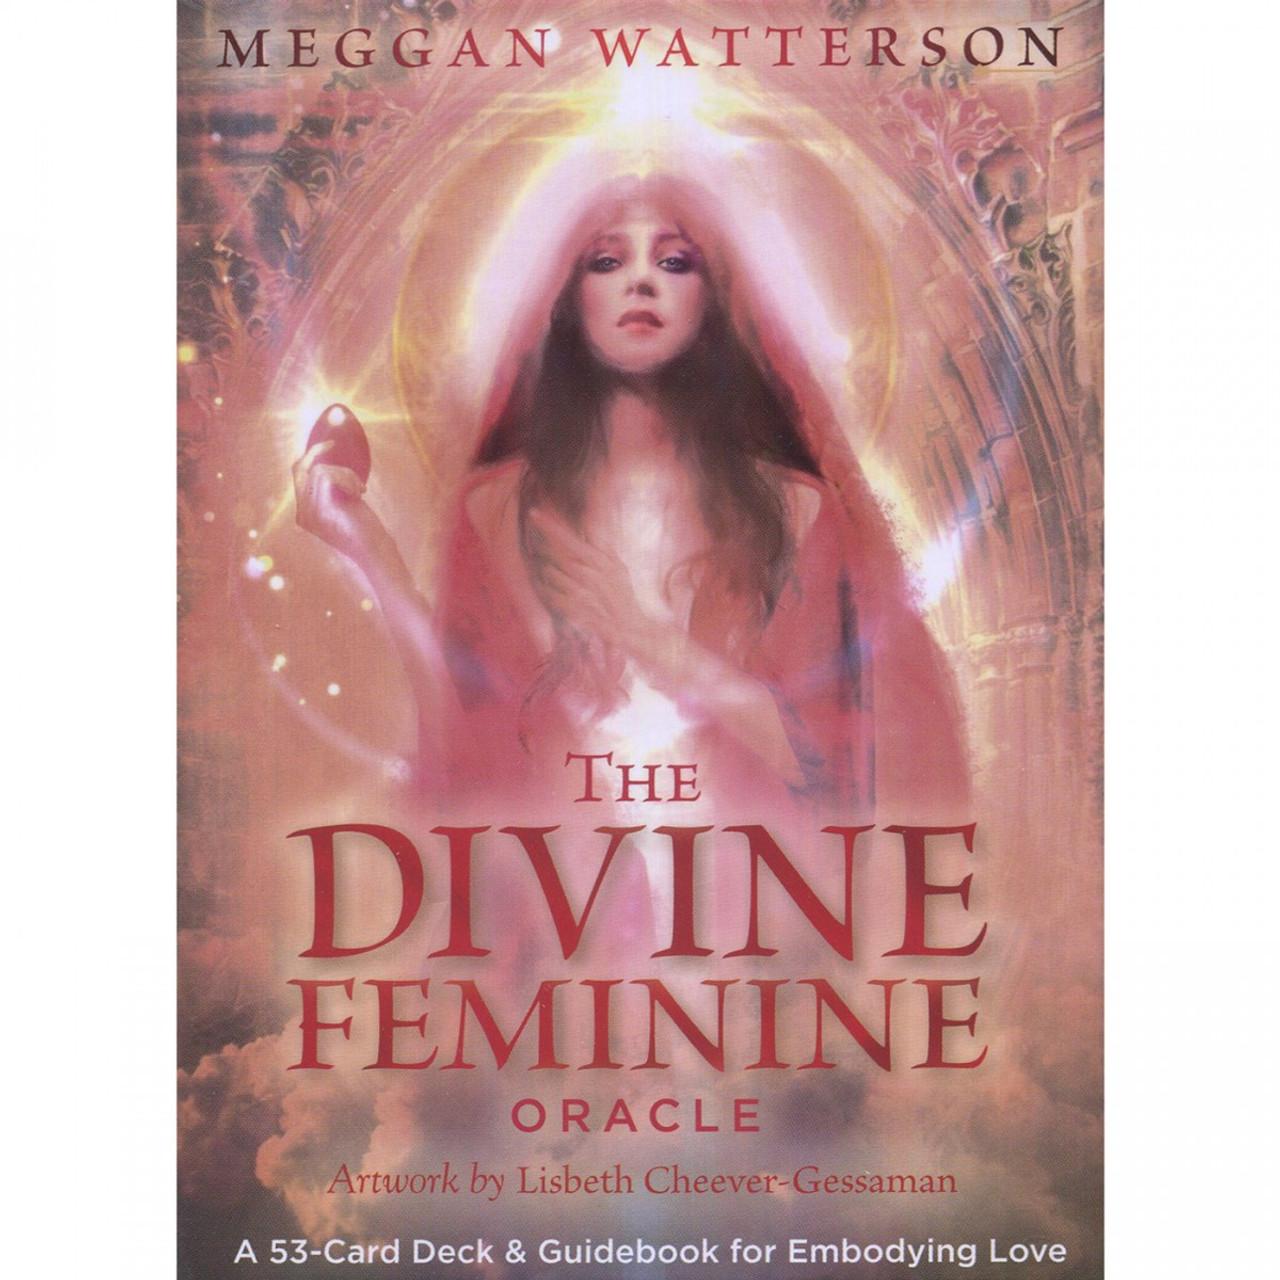 The Divine Feminine Oracle by Meggan Watterson